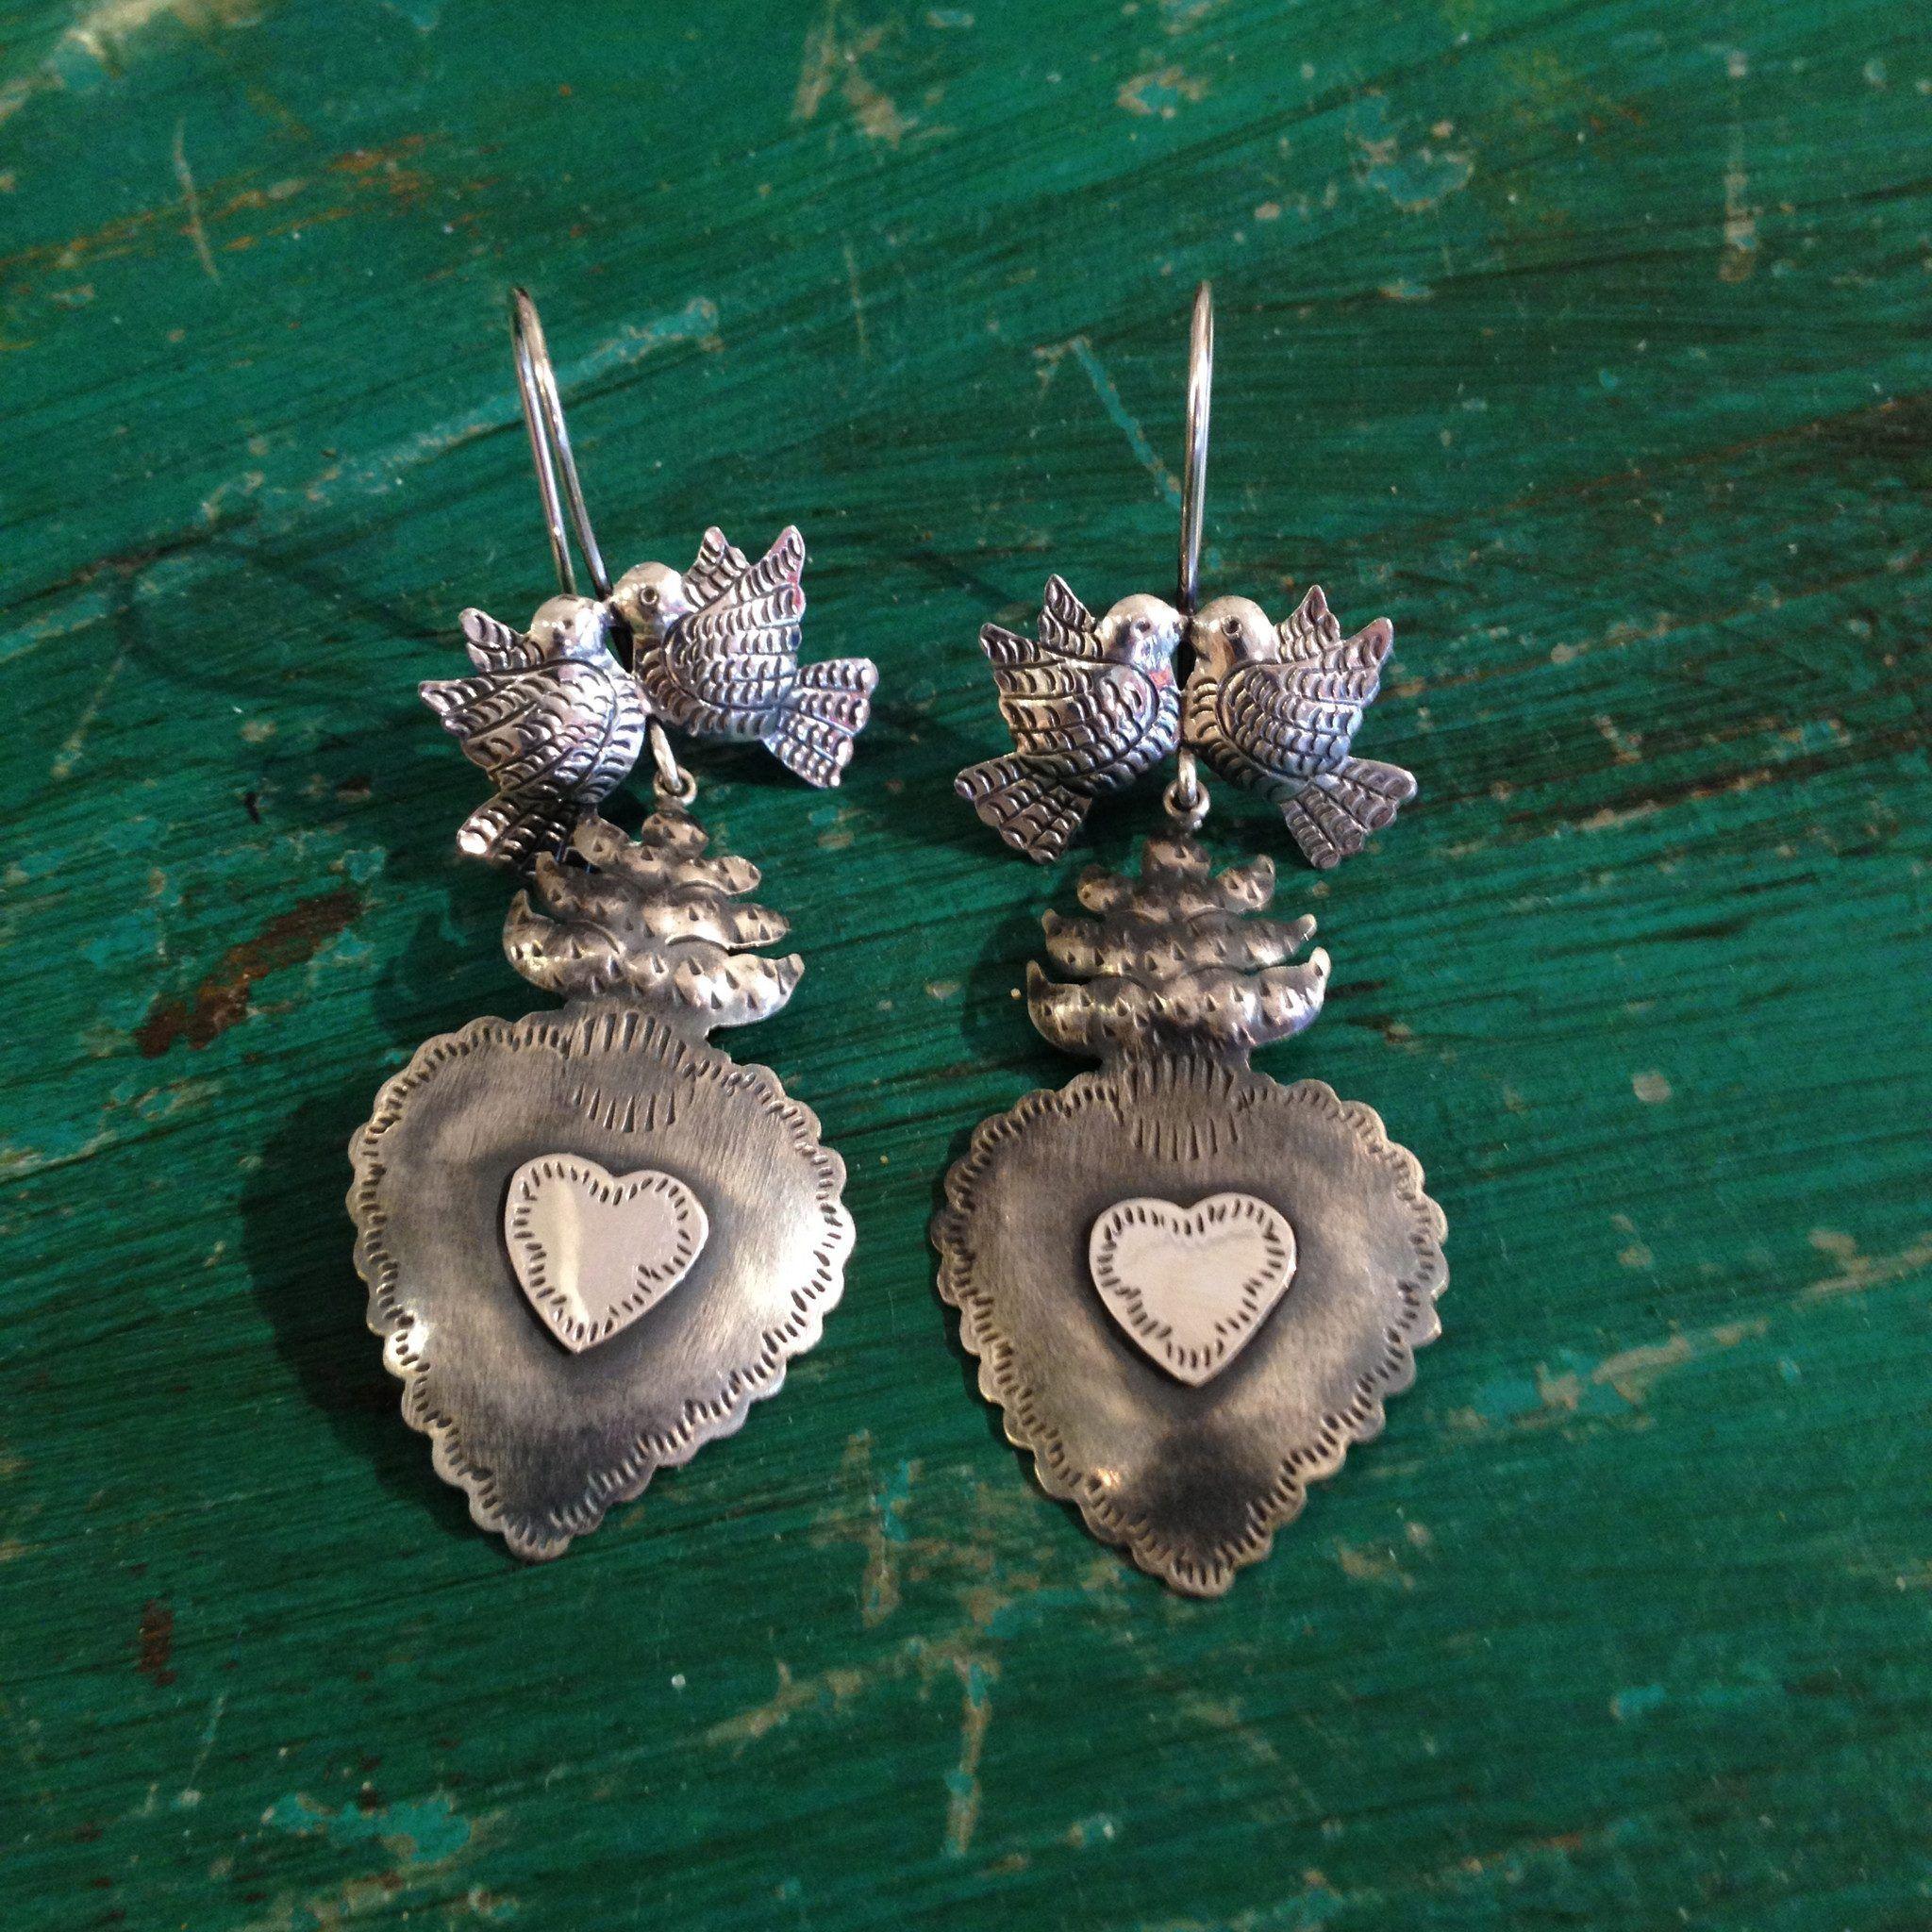 a04aad702 Zinnia Folk Arts - Silver Sacred Heart Earrings with Lovebirds, Oxidized  Silver